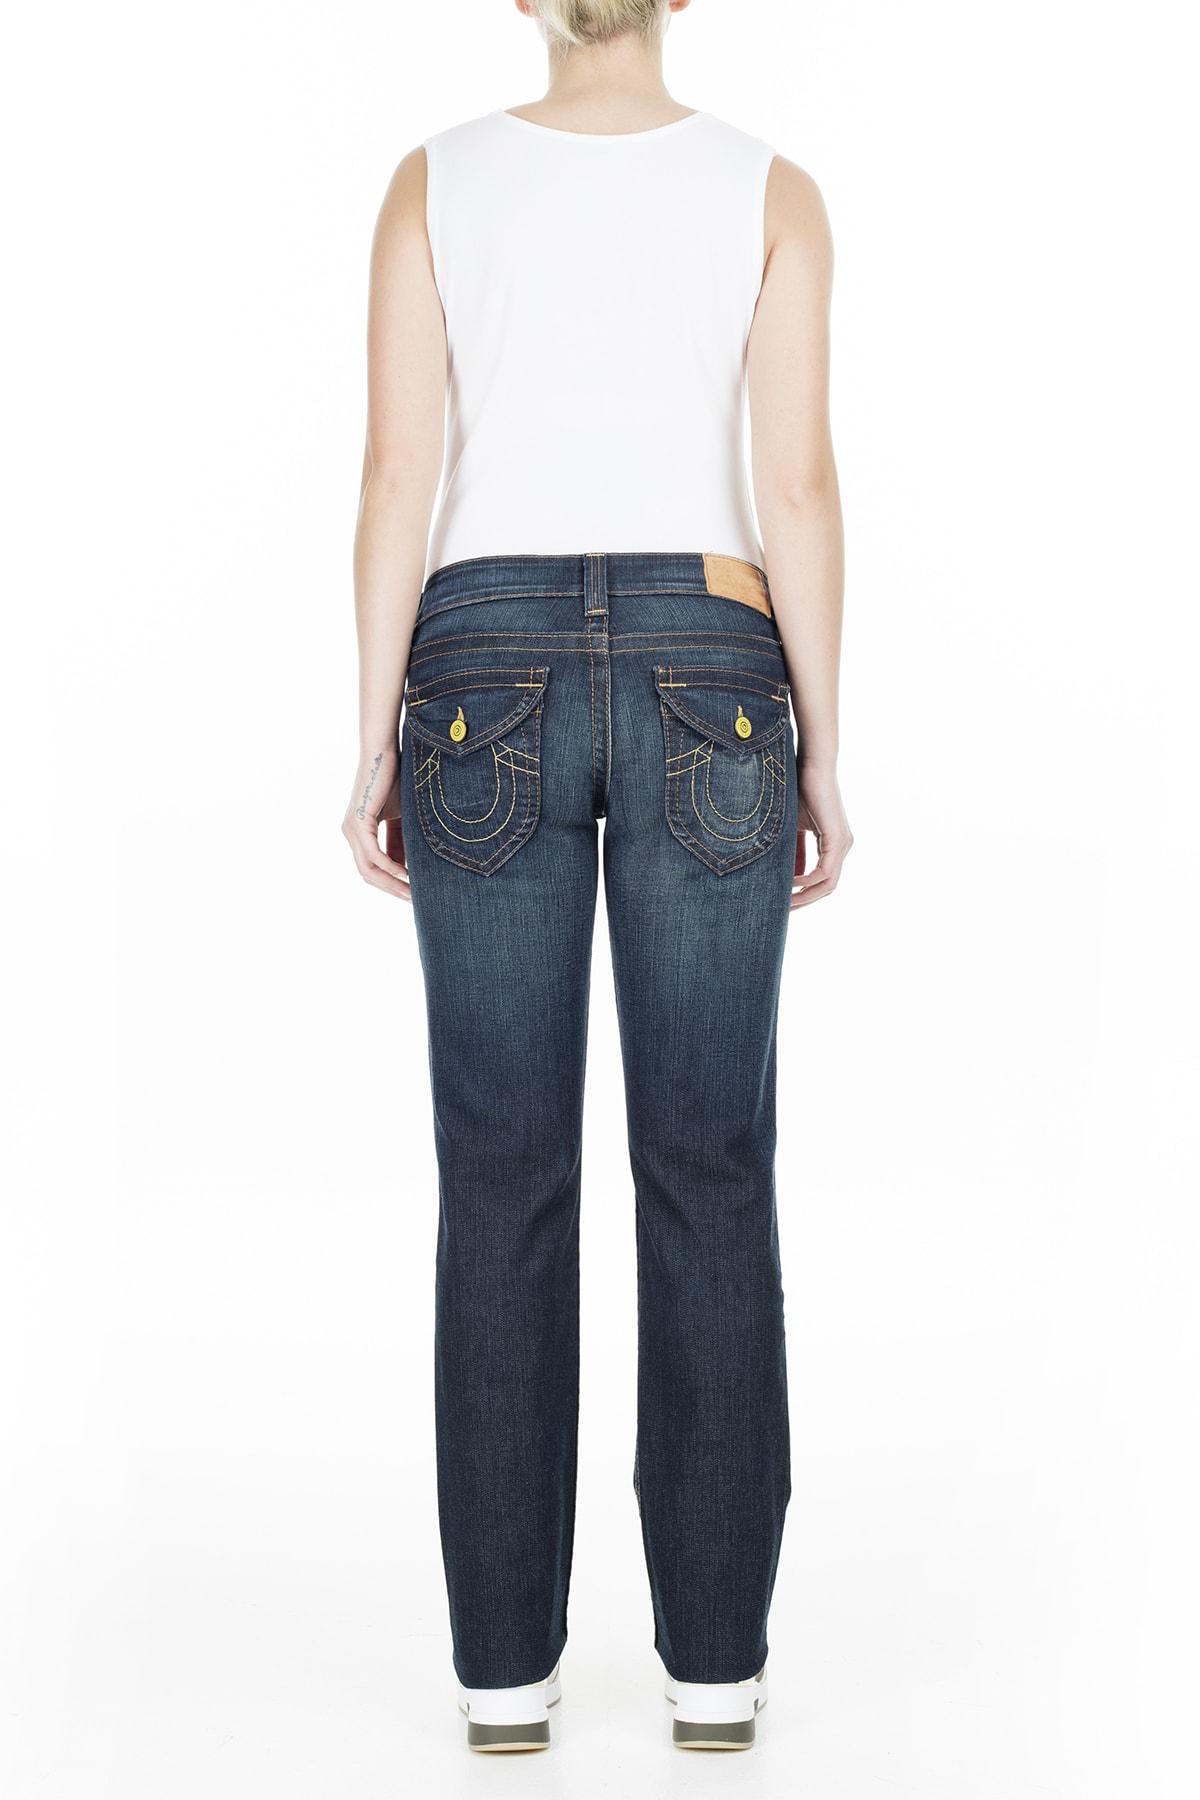 True Religion Jeans Kadın Kot Pantolon W102076E41D1 4